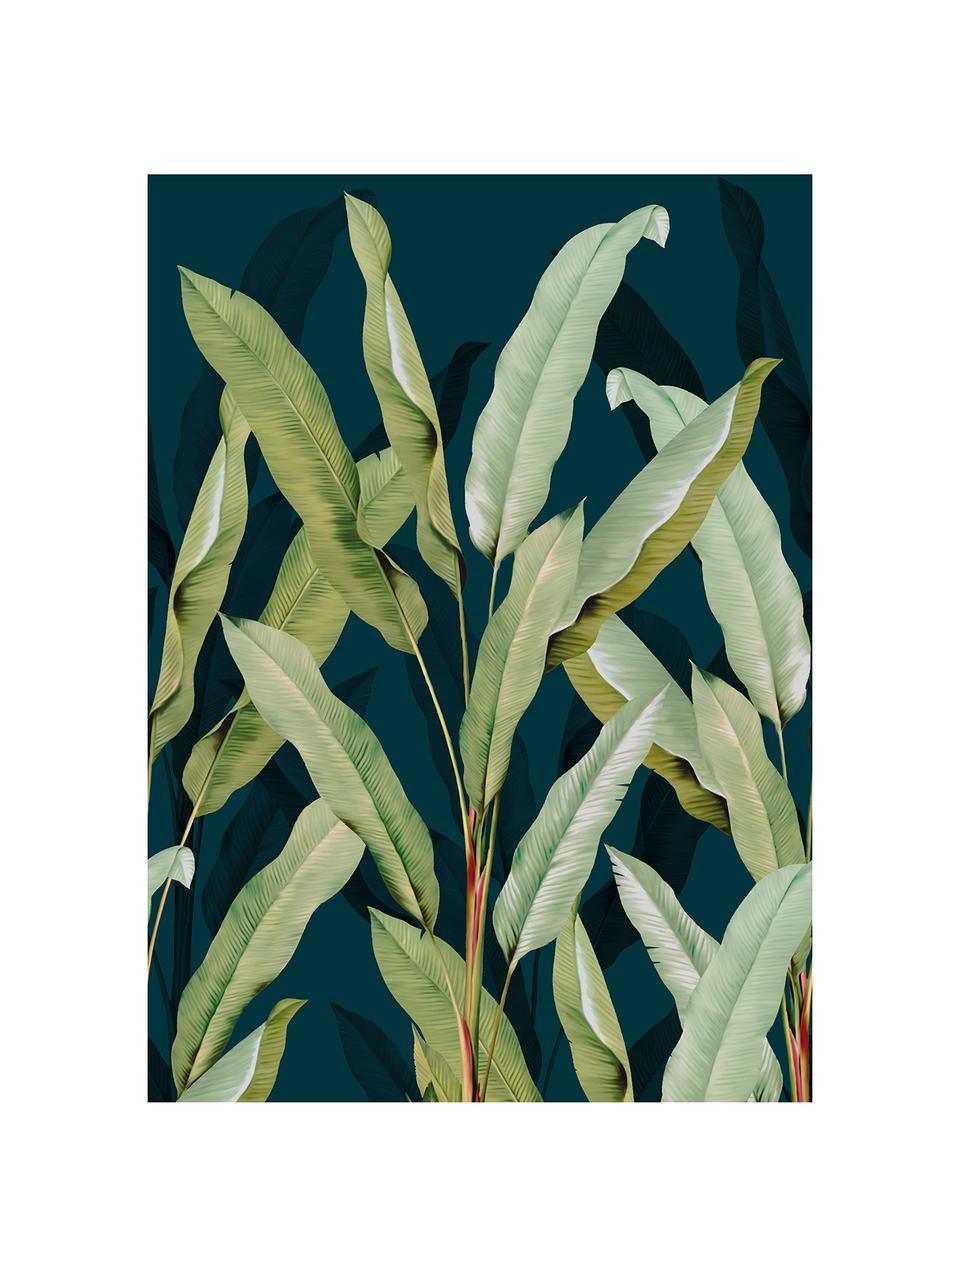 Adesivo murale oliva Branch, Tessuto non tessuto, Blu, verde, Larg. 200 x Alt. 280 cm